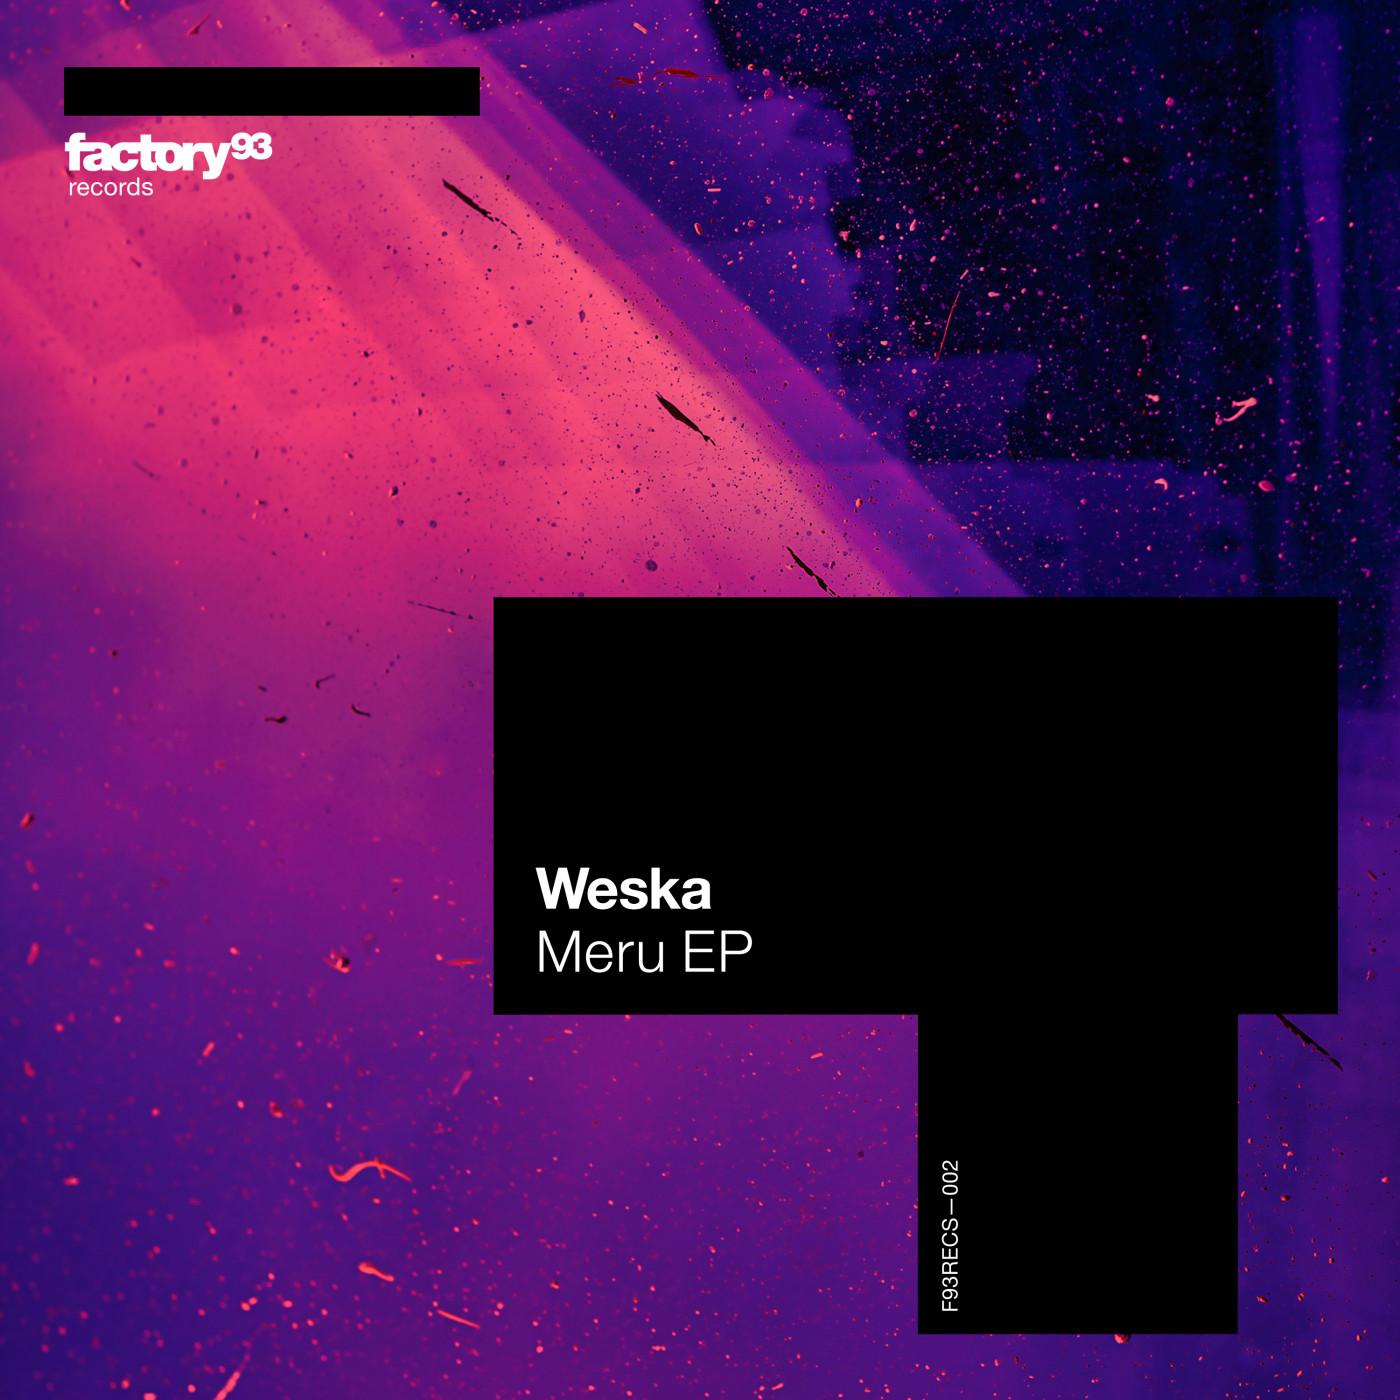 Weska – Meru EP